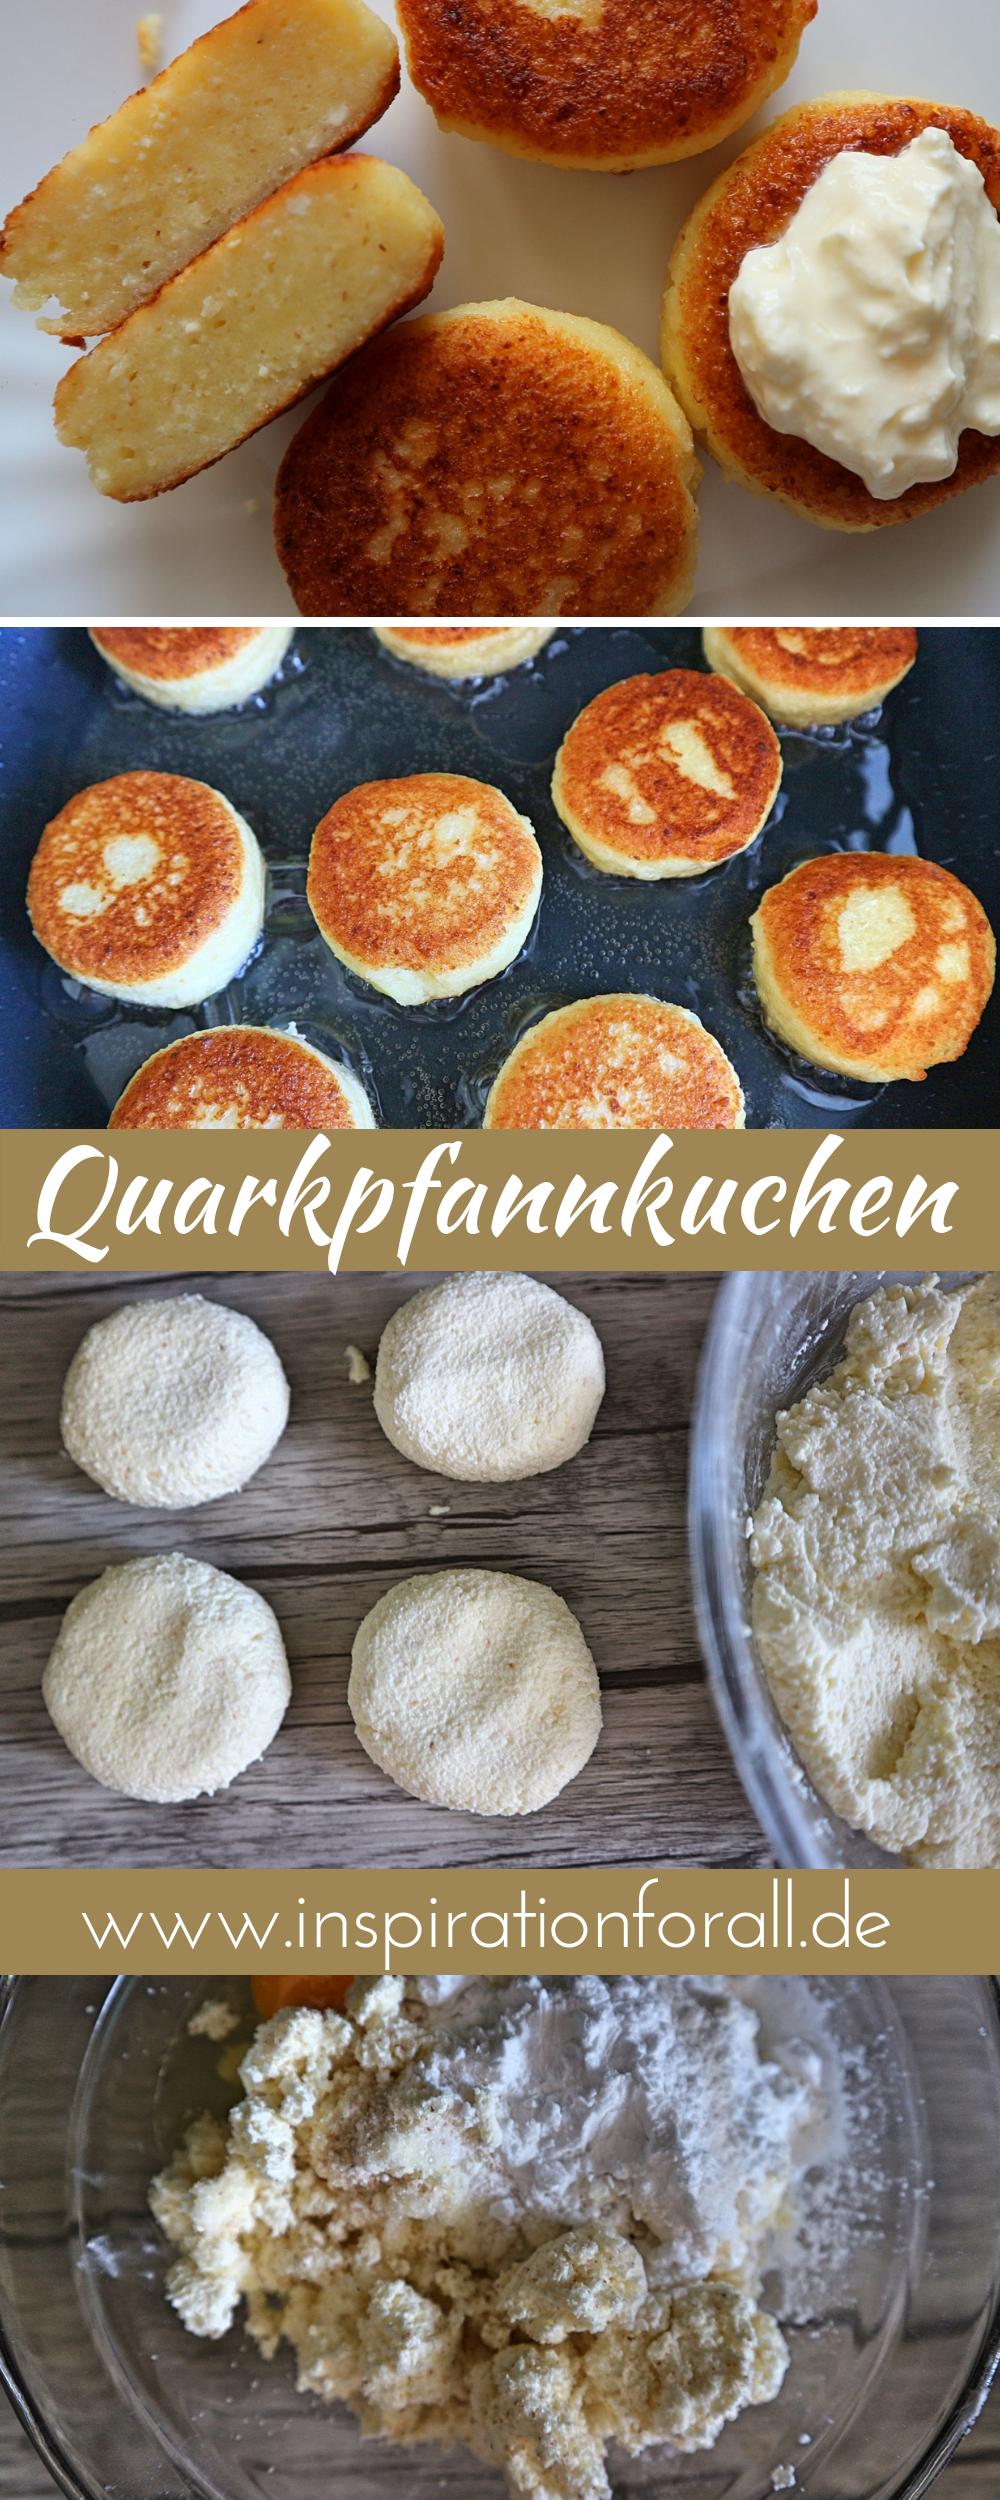 Photo of Quark pancakes without flour – simple & quick recipe